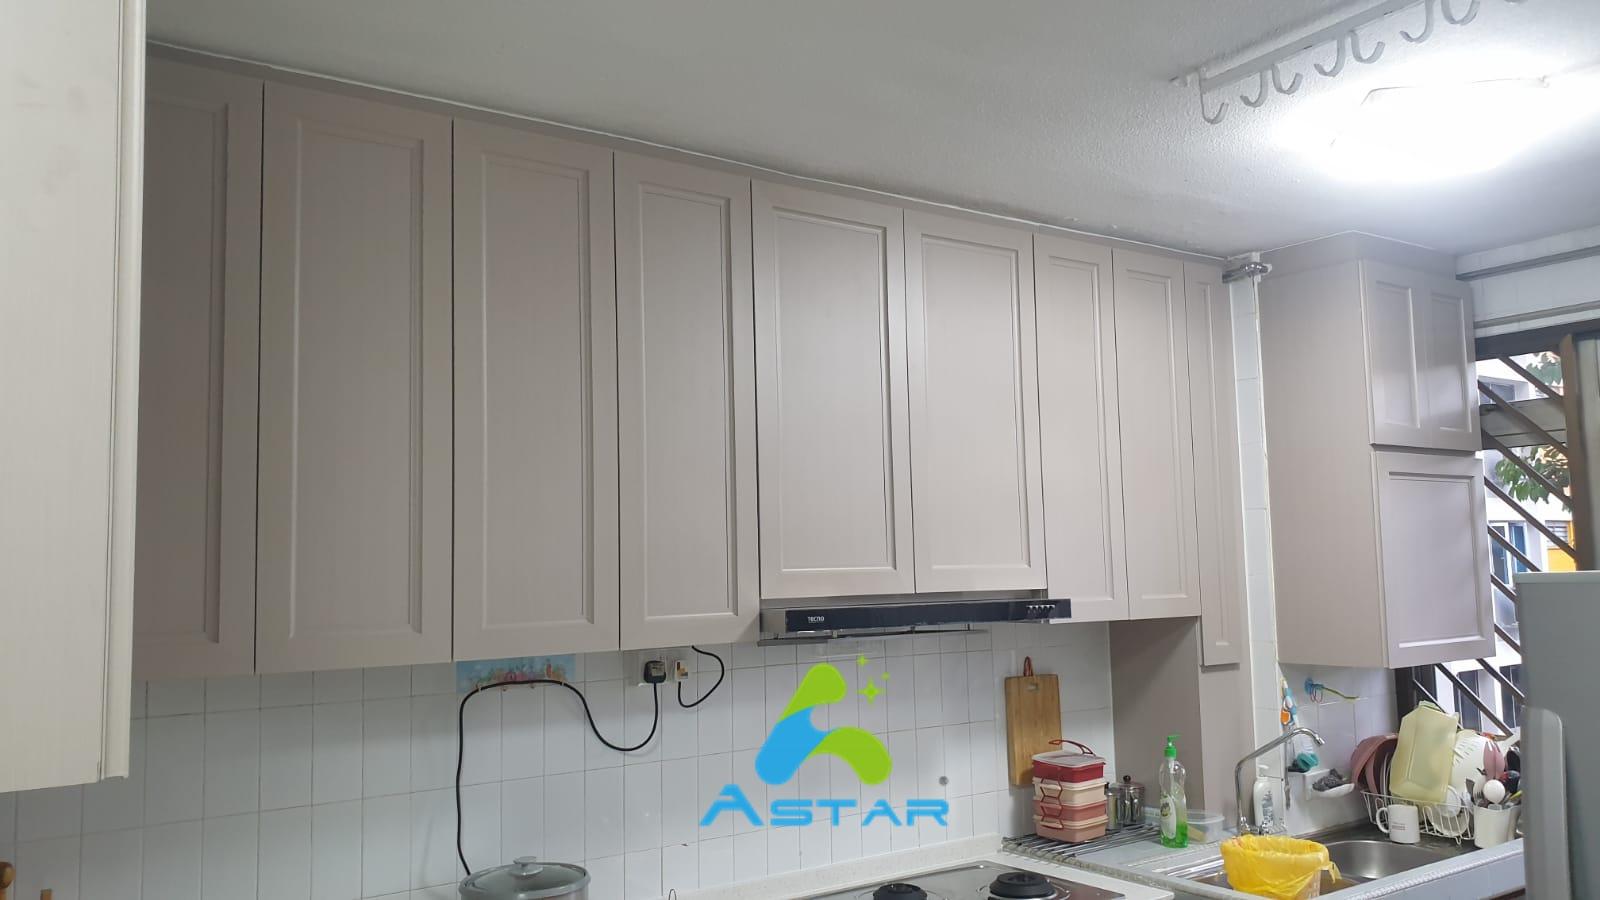 a star furnishing projects Blk 816 Yishun St 81 S 760816 6